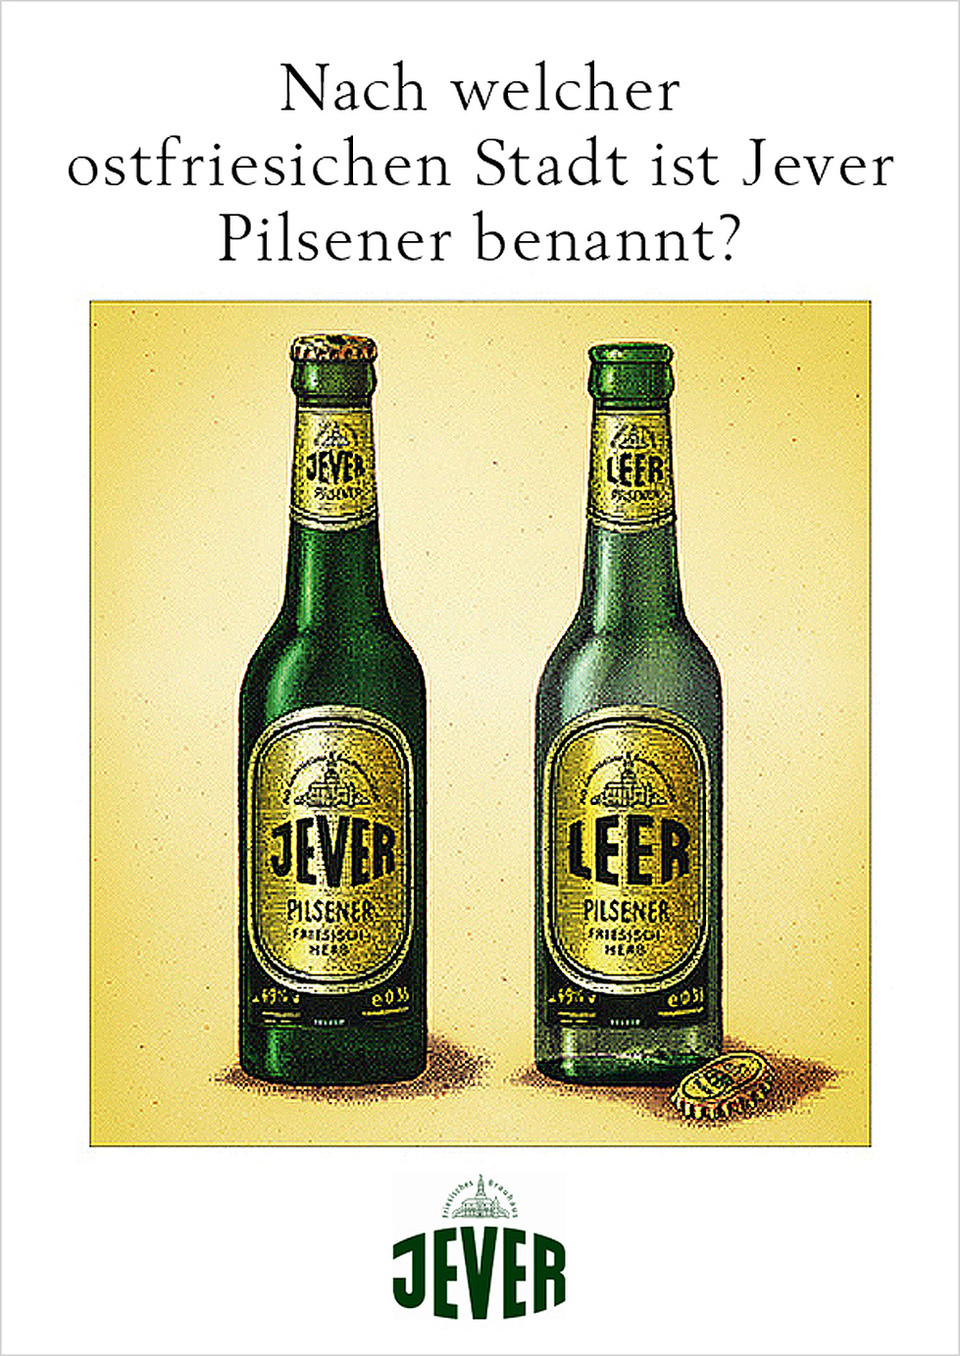 Regionalkampagnen für Jever Pilsener